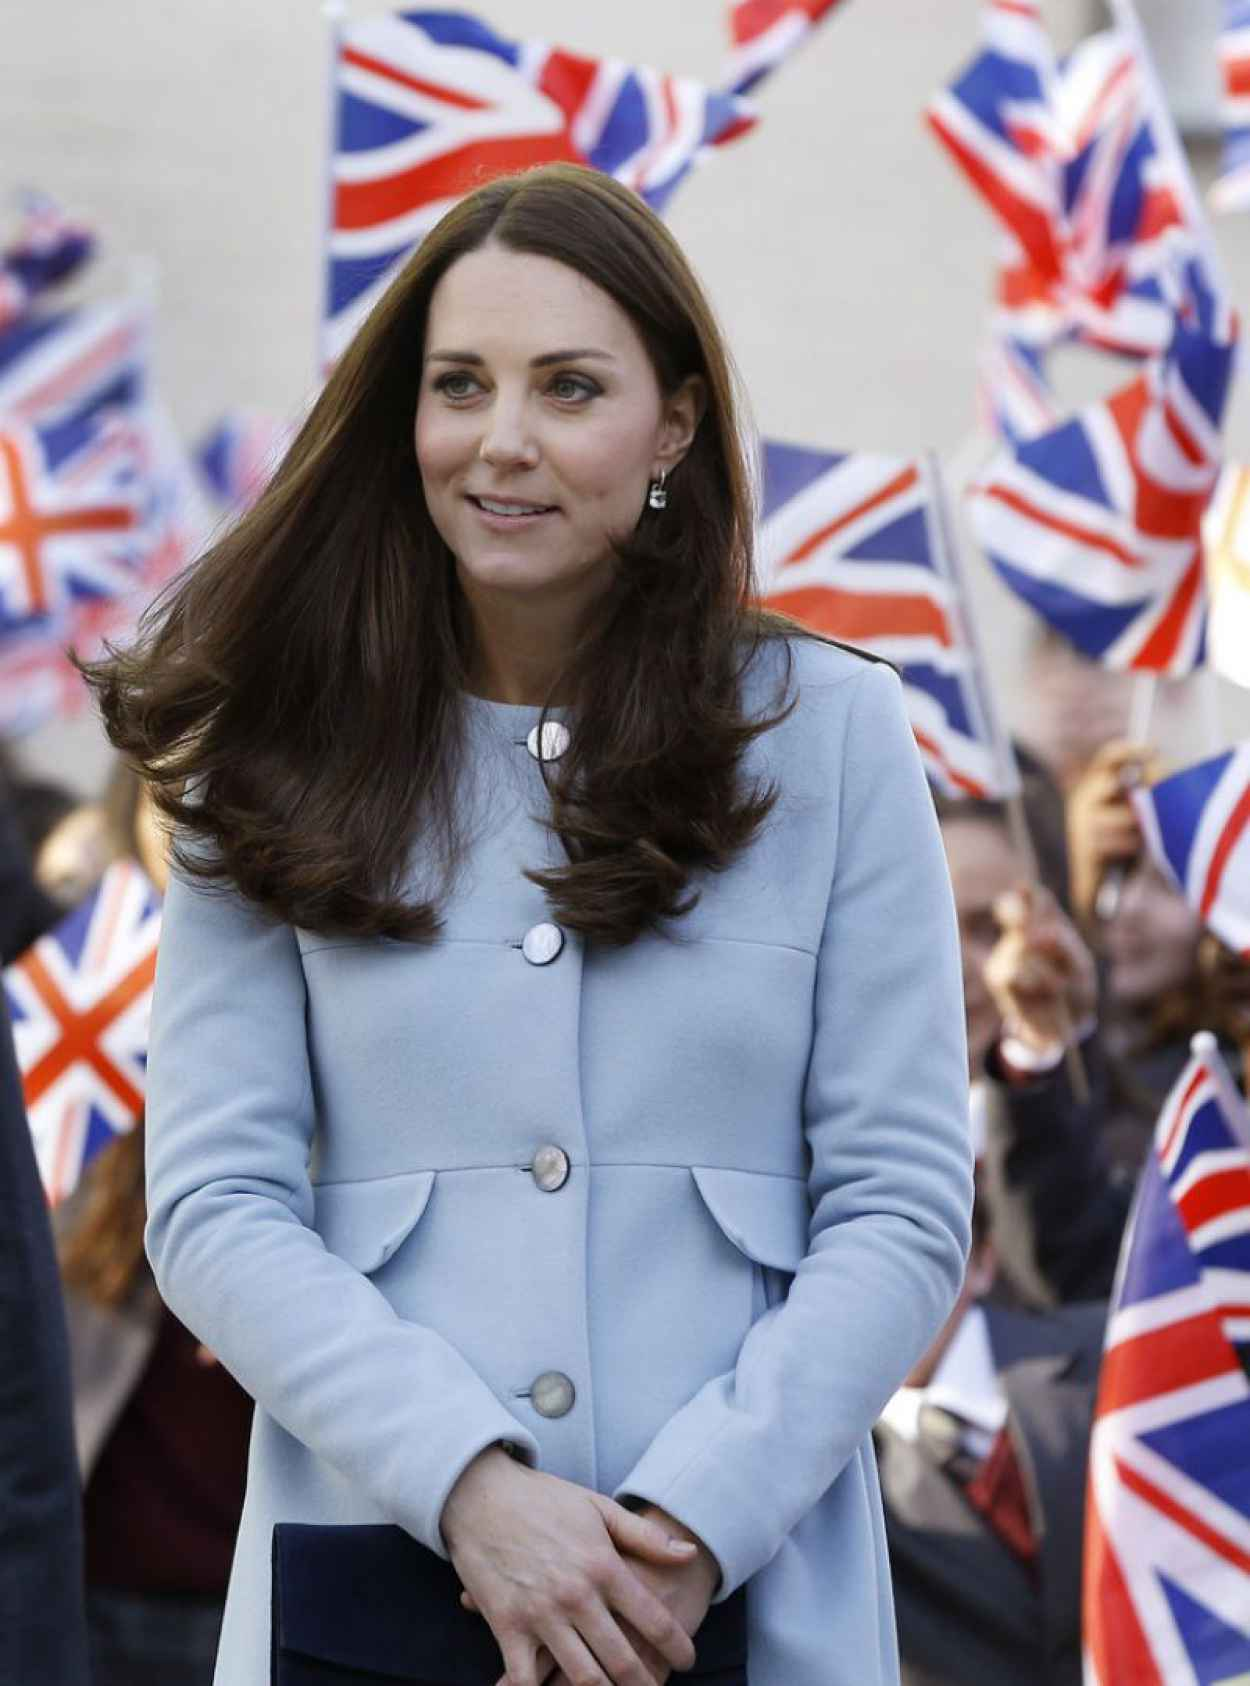 Kate Middleton - Visits The Kensington Leisure Centre in London, Part 2-1